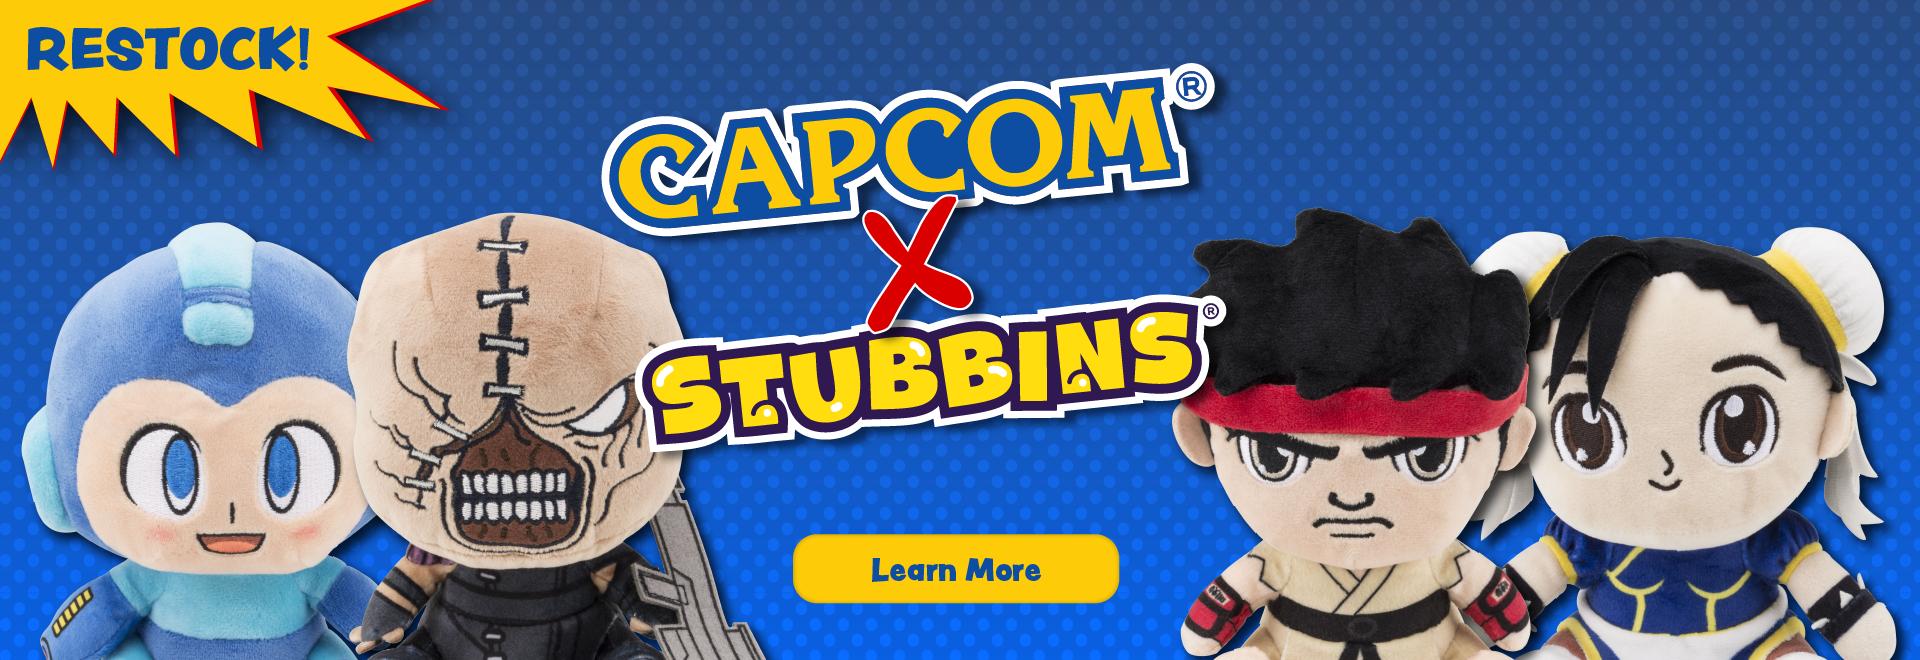 CapcomxStubbins-Restock